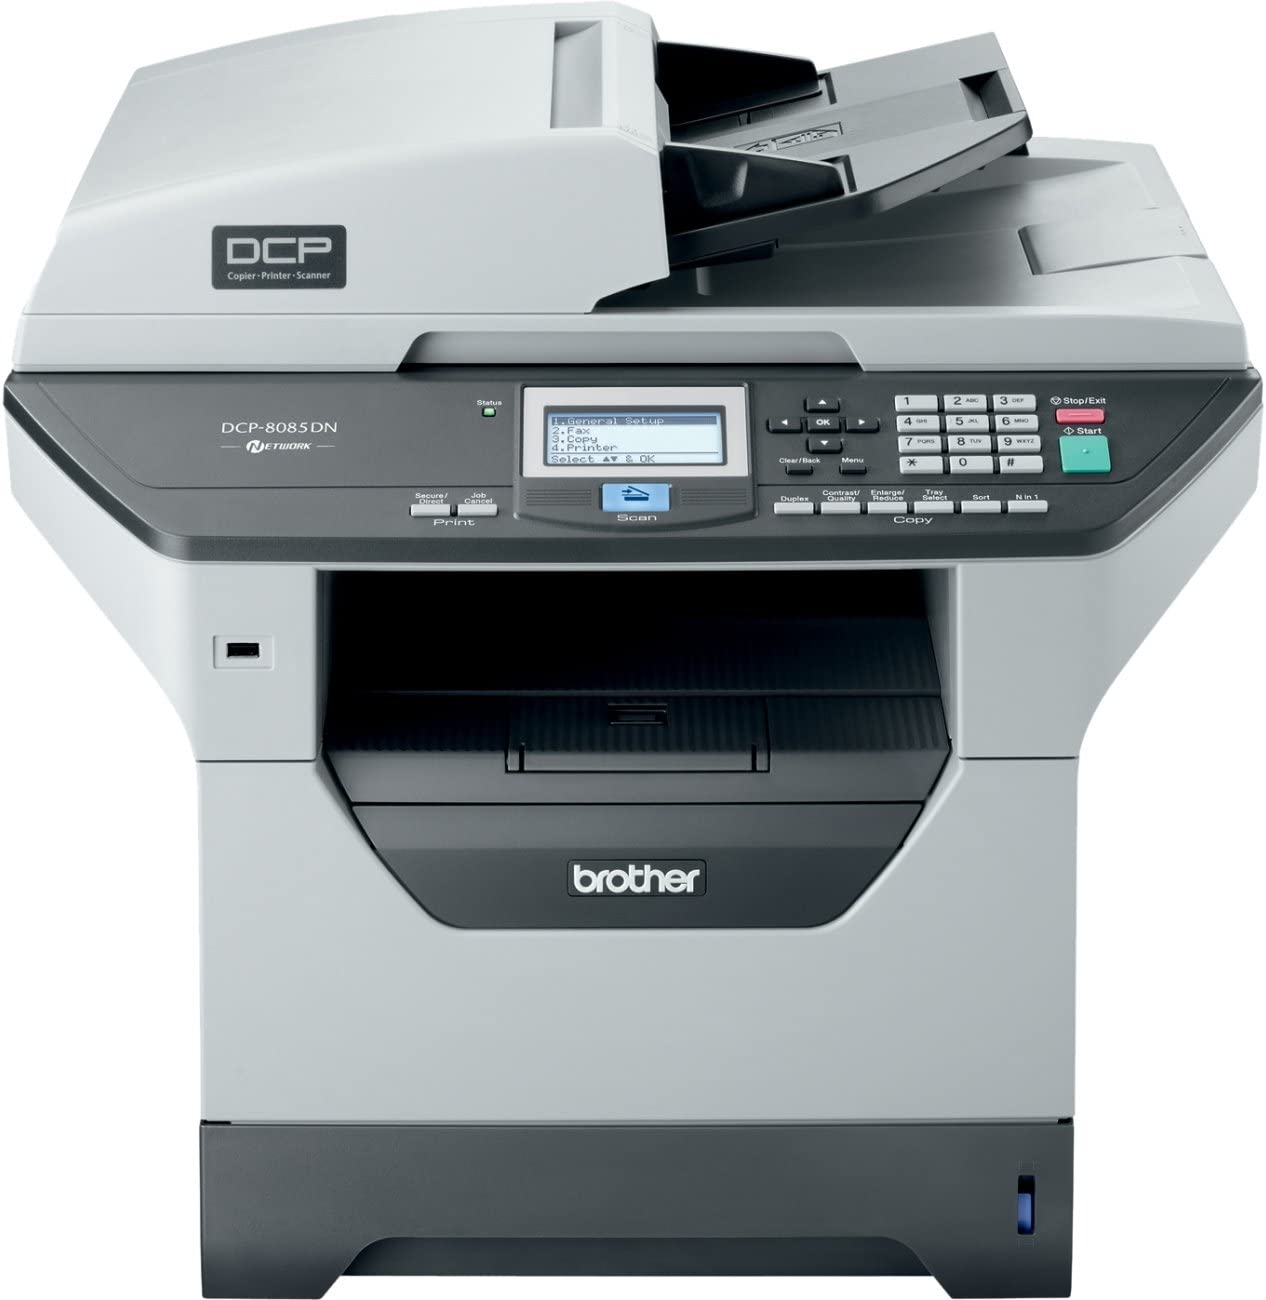 Brother DCP8085DN Multifunktionsger/ät USB 2.0, 64MB Speicher, 30 S//min, Papierkassette